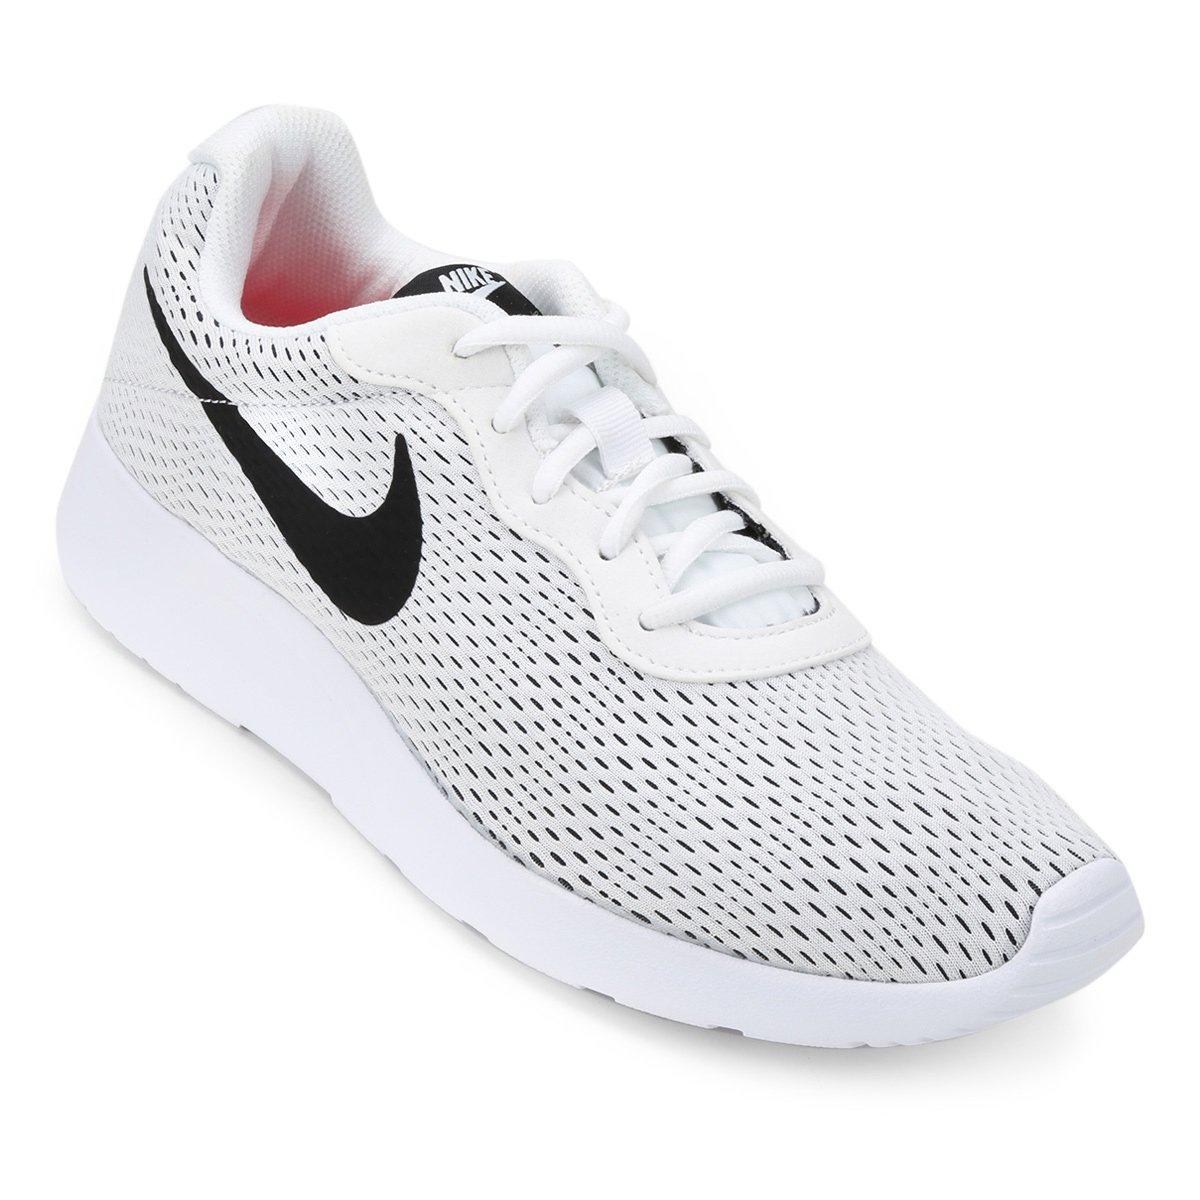 42d326562 Tênis Nike Tanjun Se Masculino - Compre Agora